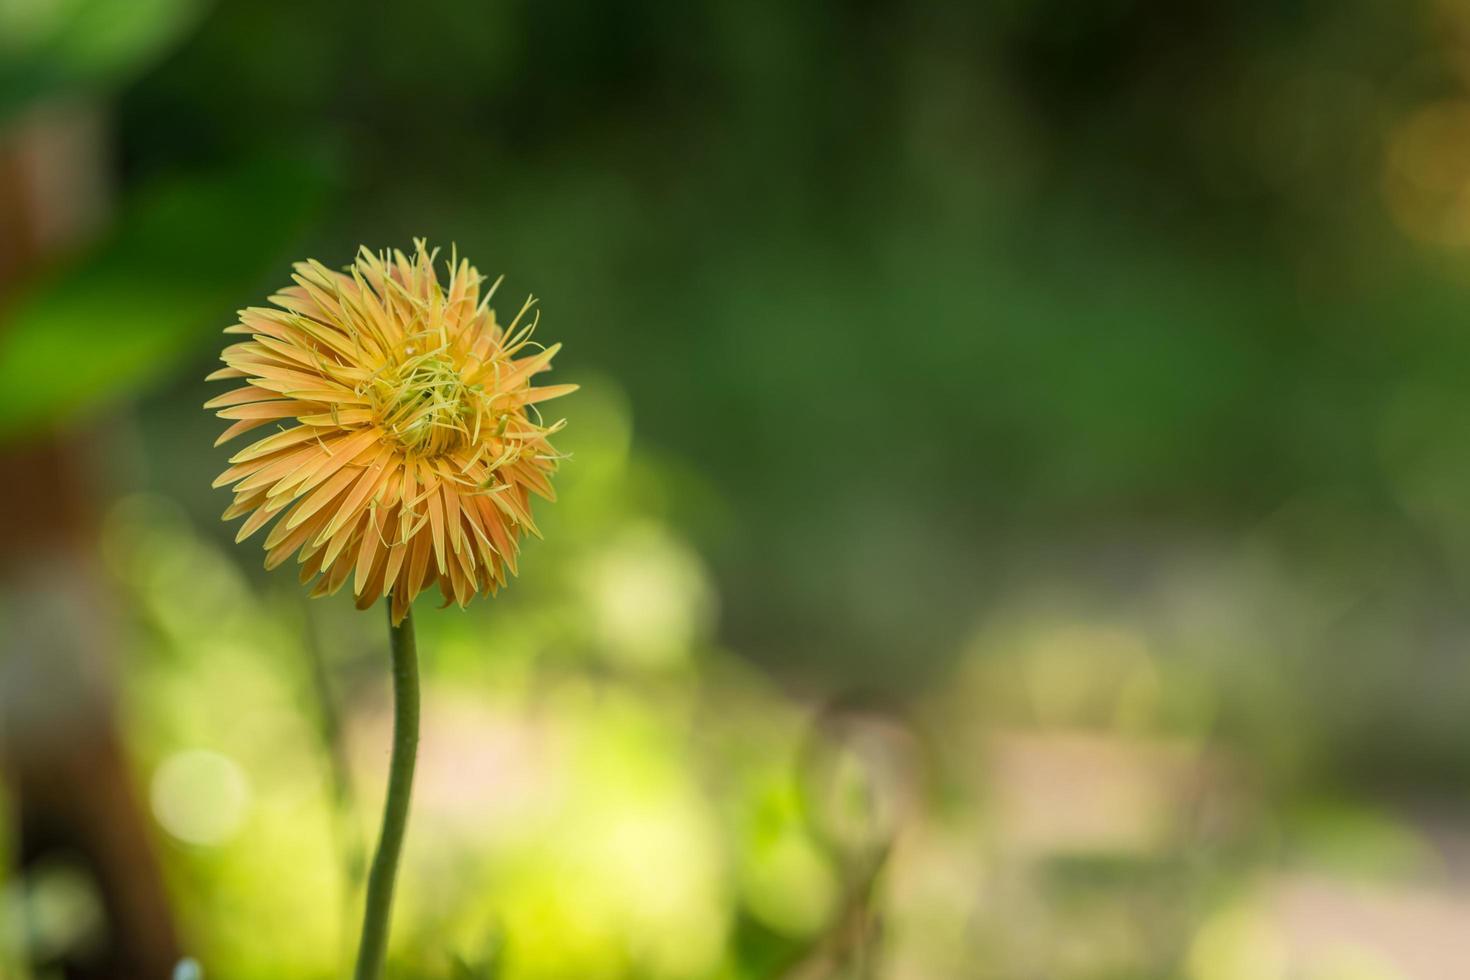 fleur jaune sur fond vert photo